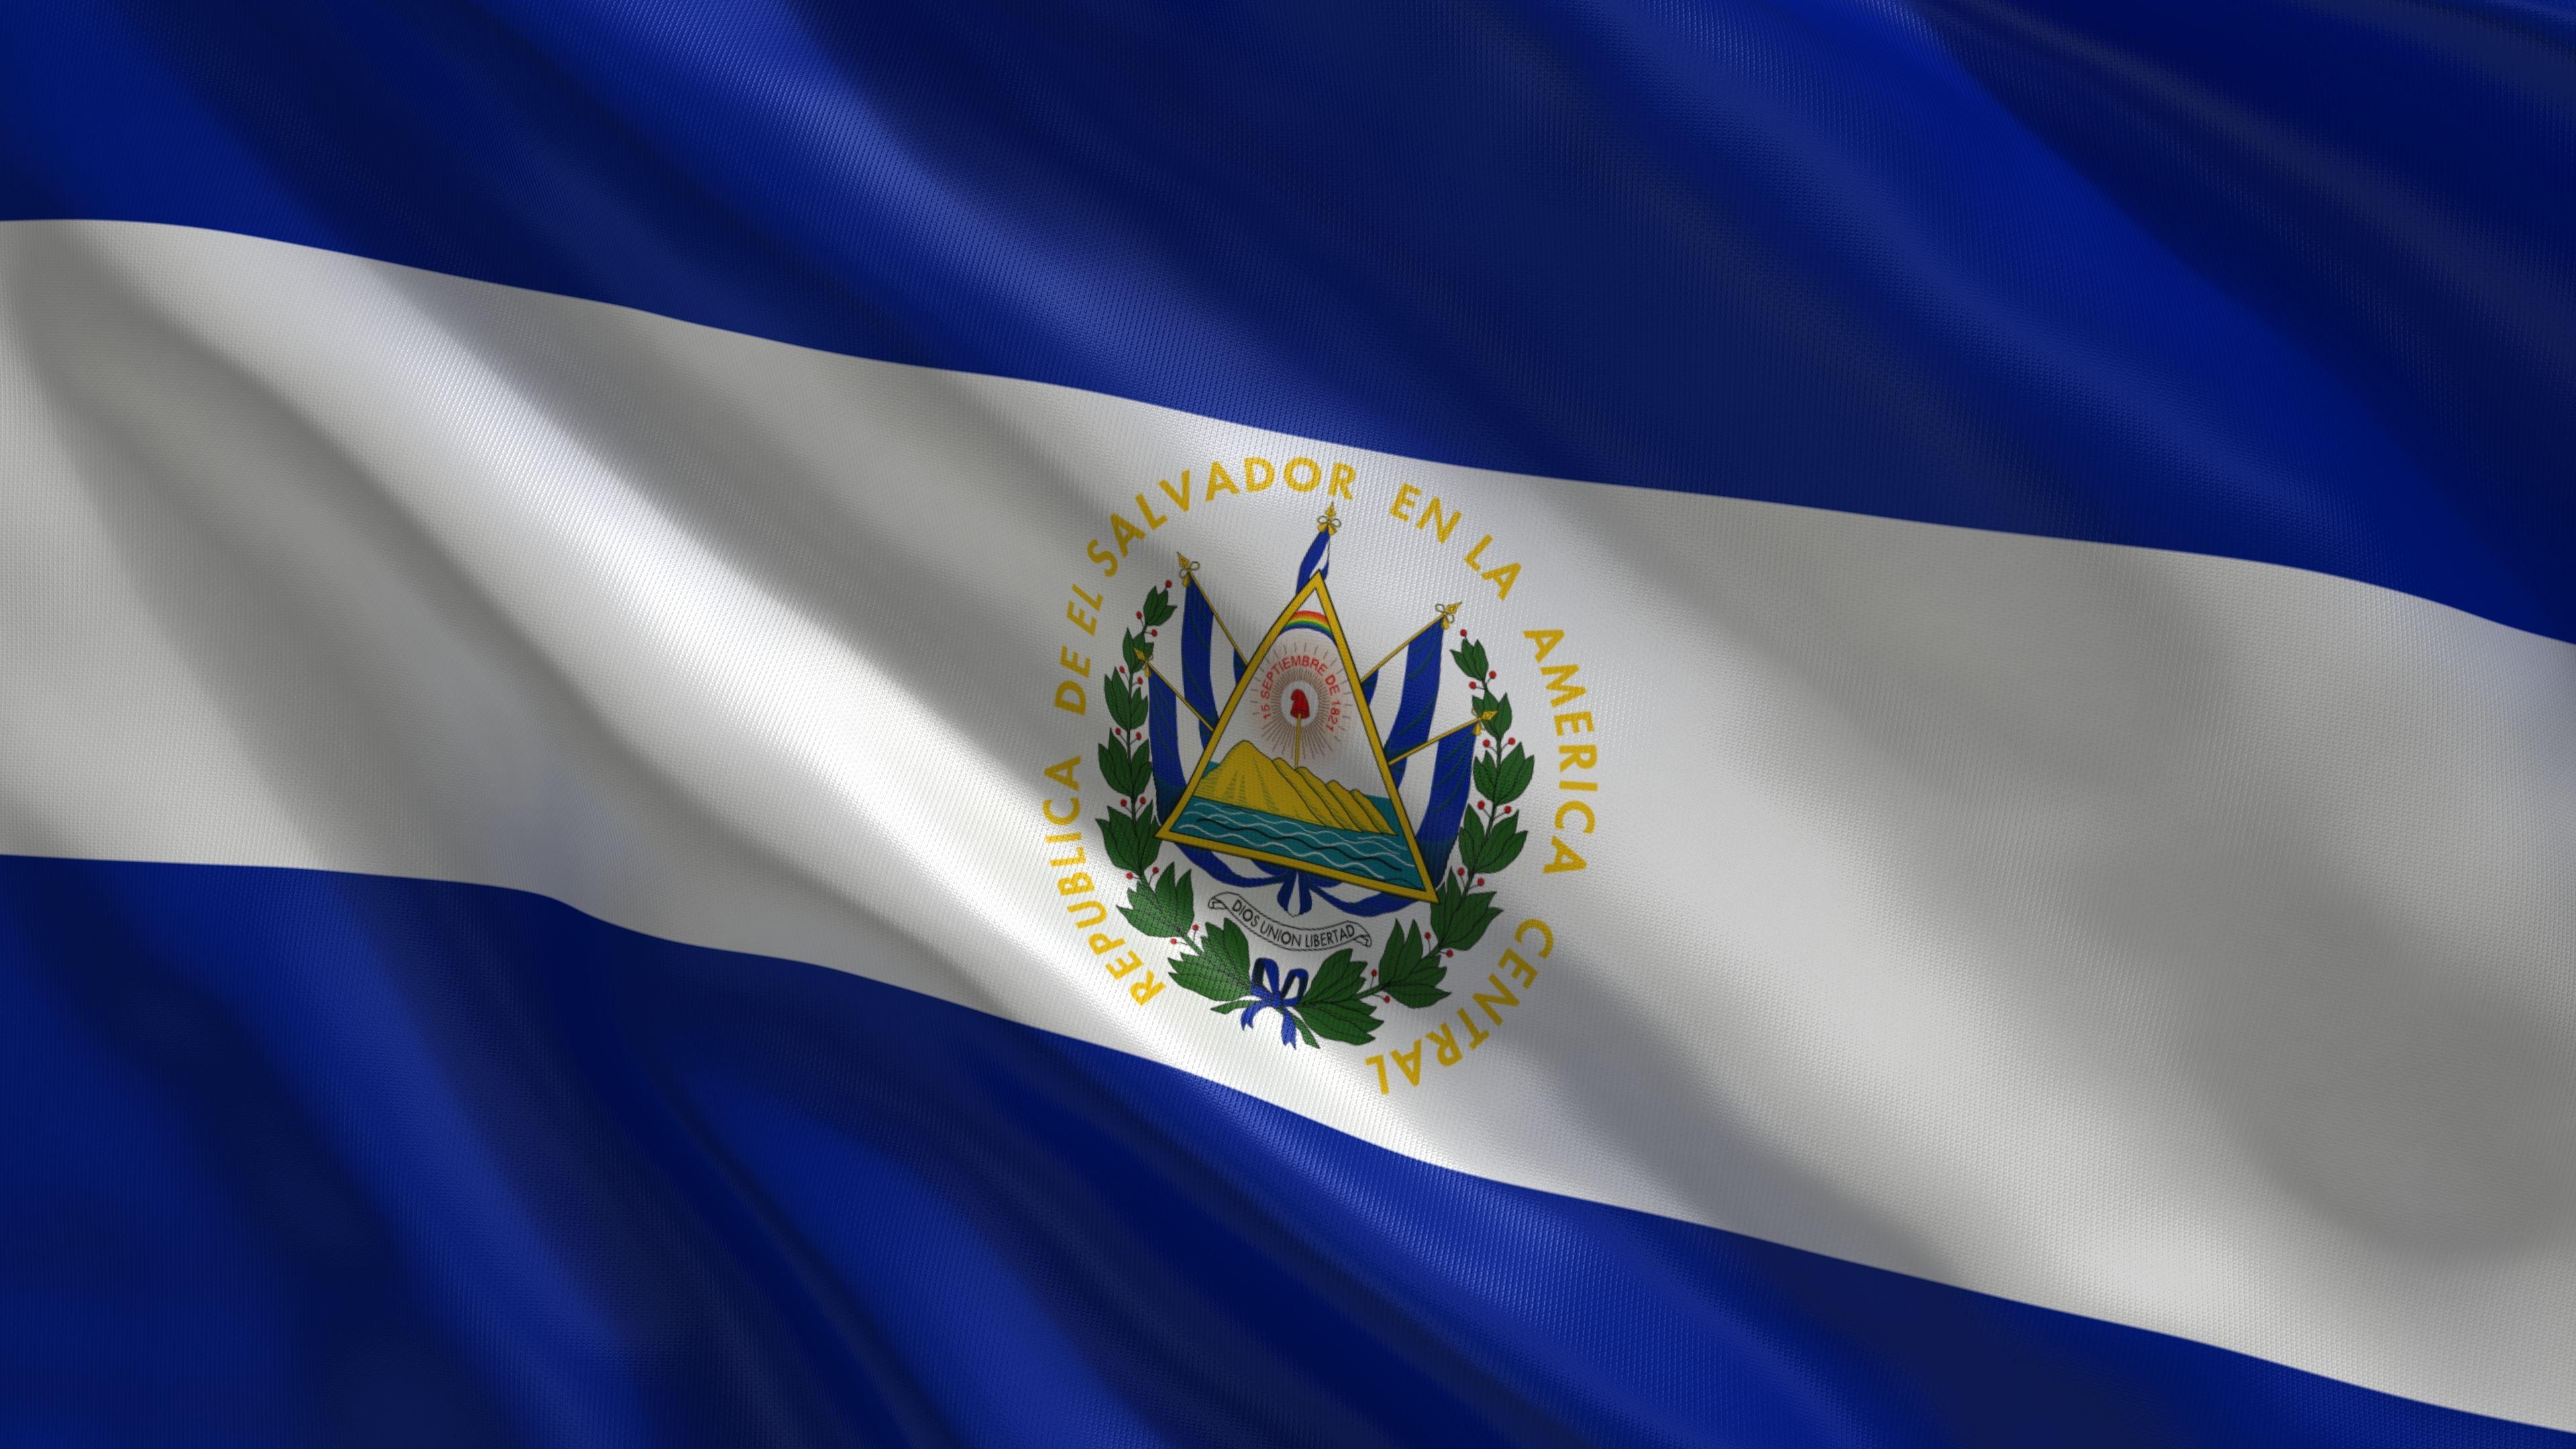 Bandera,el salvador, flag, bandera el salvador, el salvador flag, flags, banderas, salvador   Bandera de el salvador, El salvador, Banderas del mundo